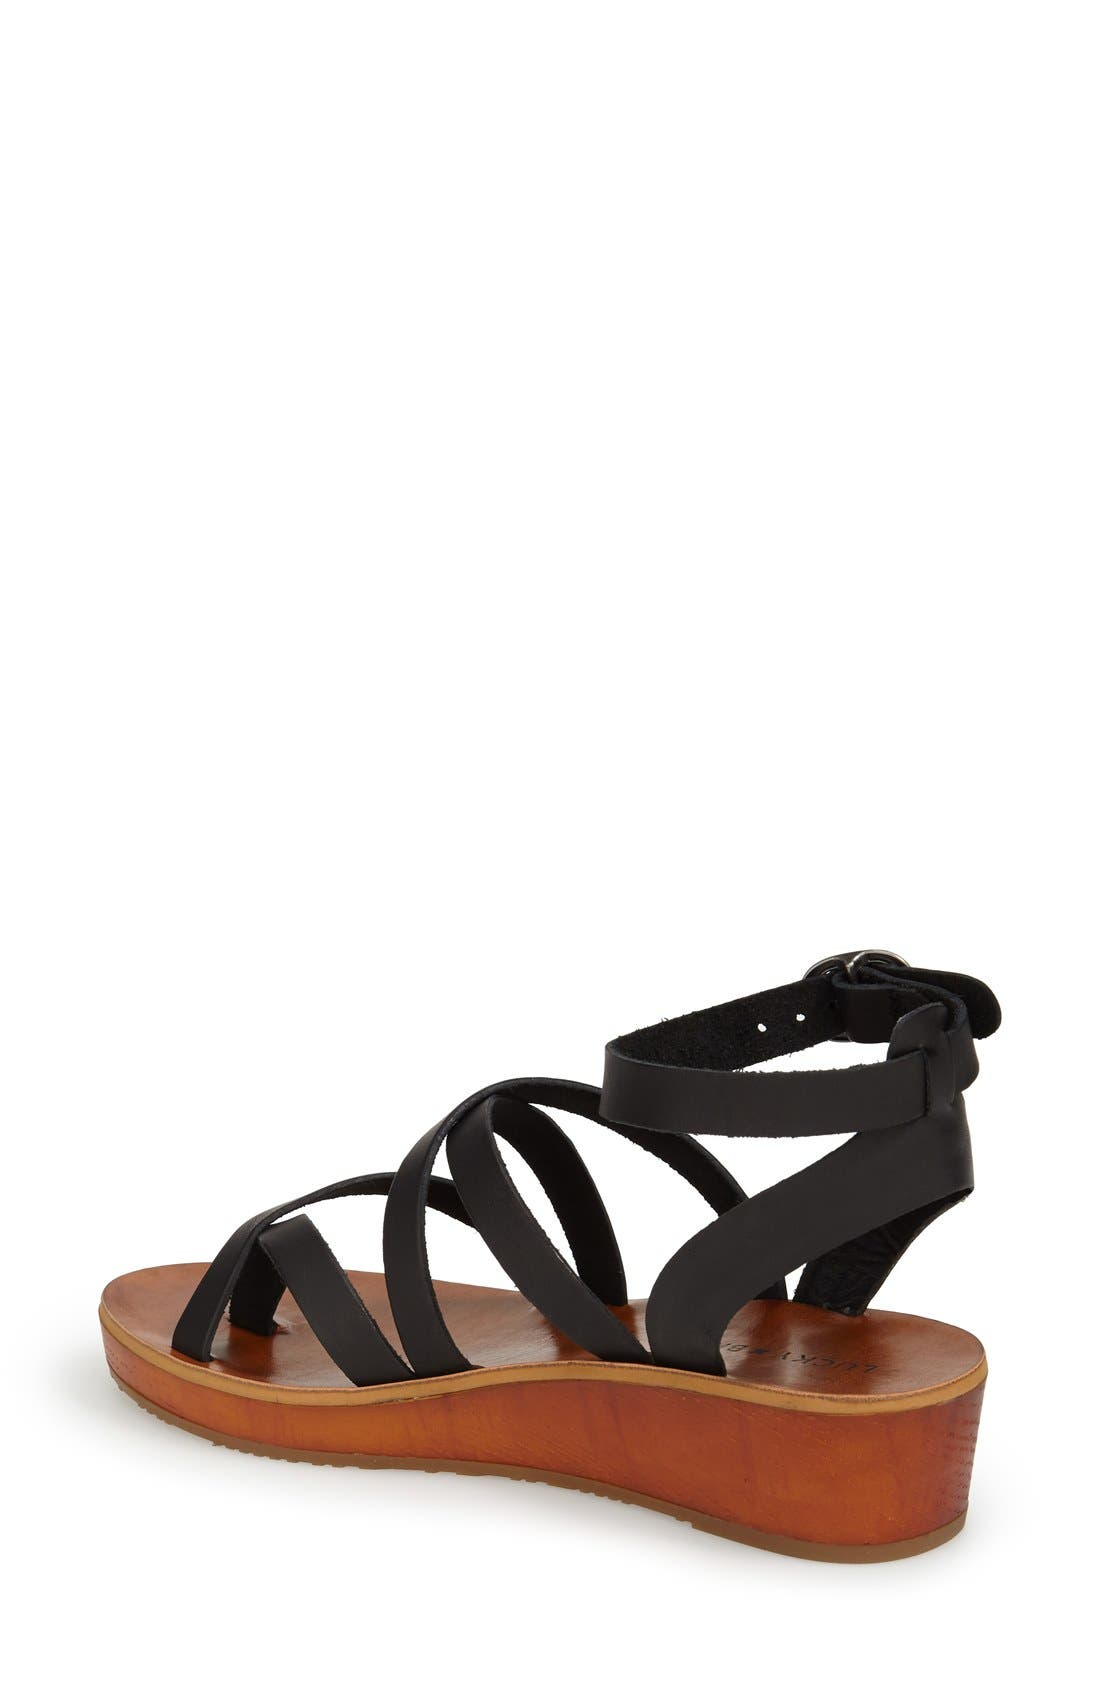 'Honeyy' Platform Sandal,                             Alternate thumbnail 6, color,